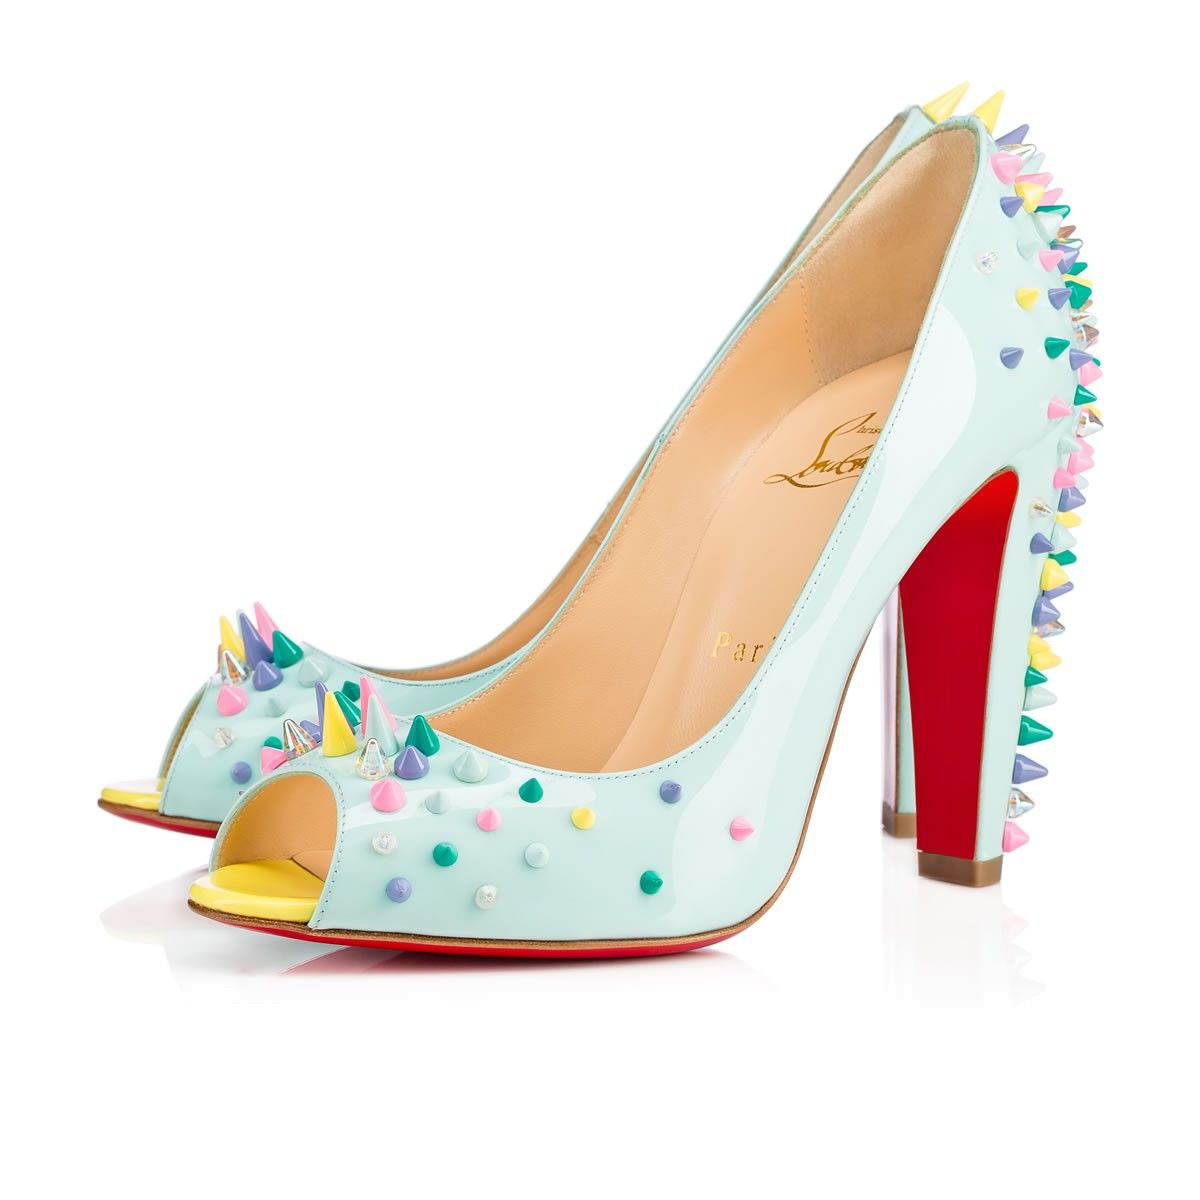 Pin on Christian Louboutin shoes